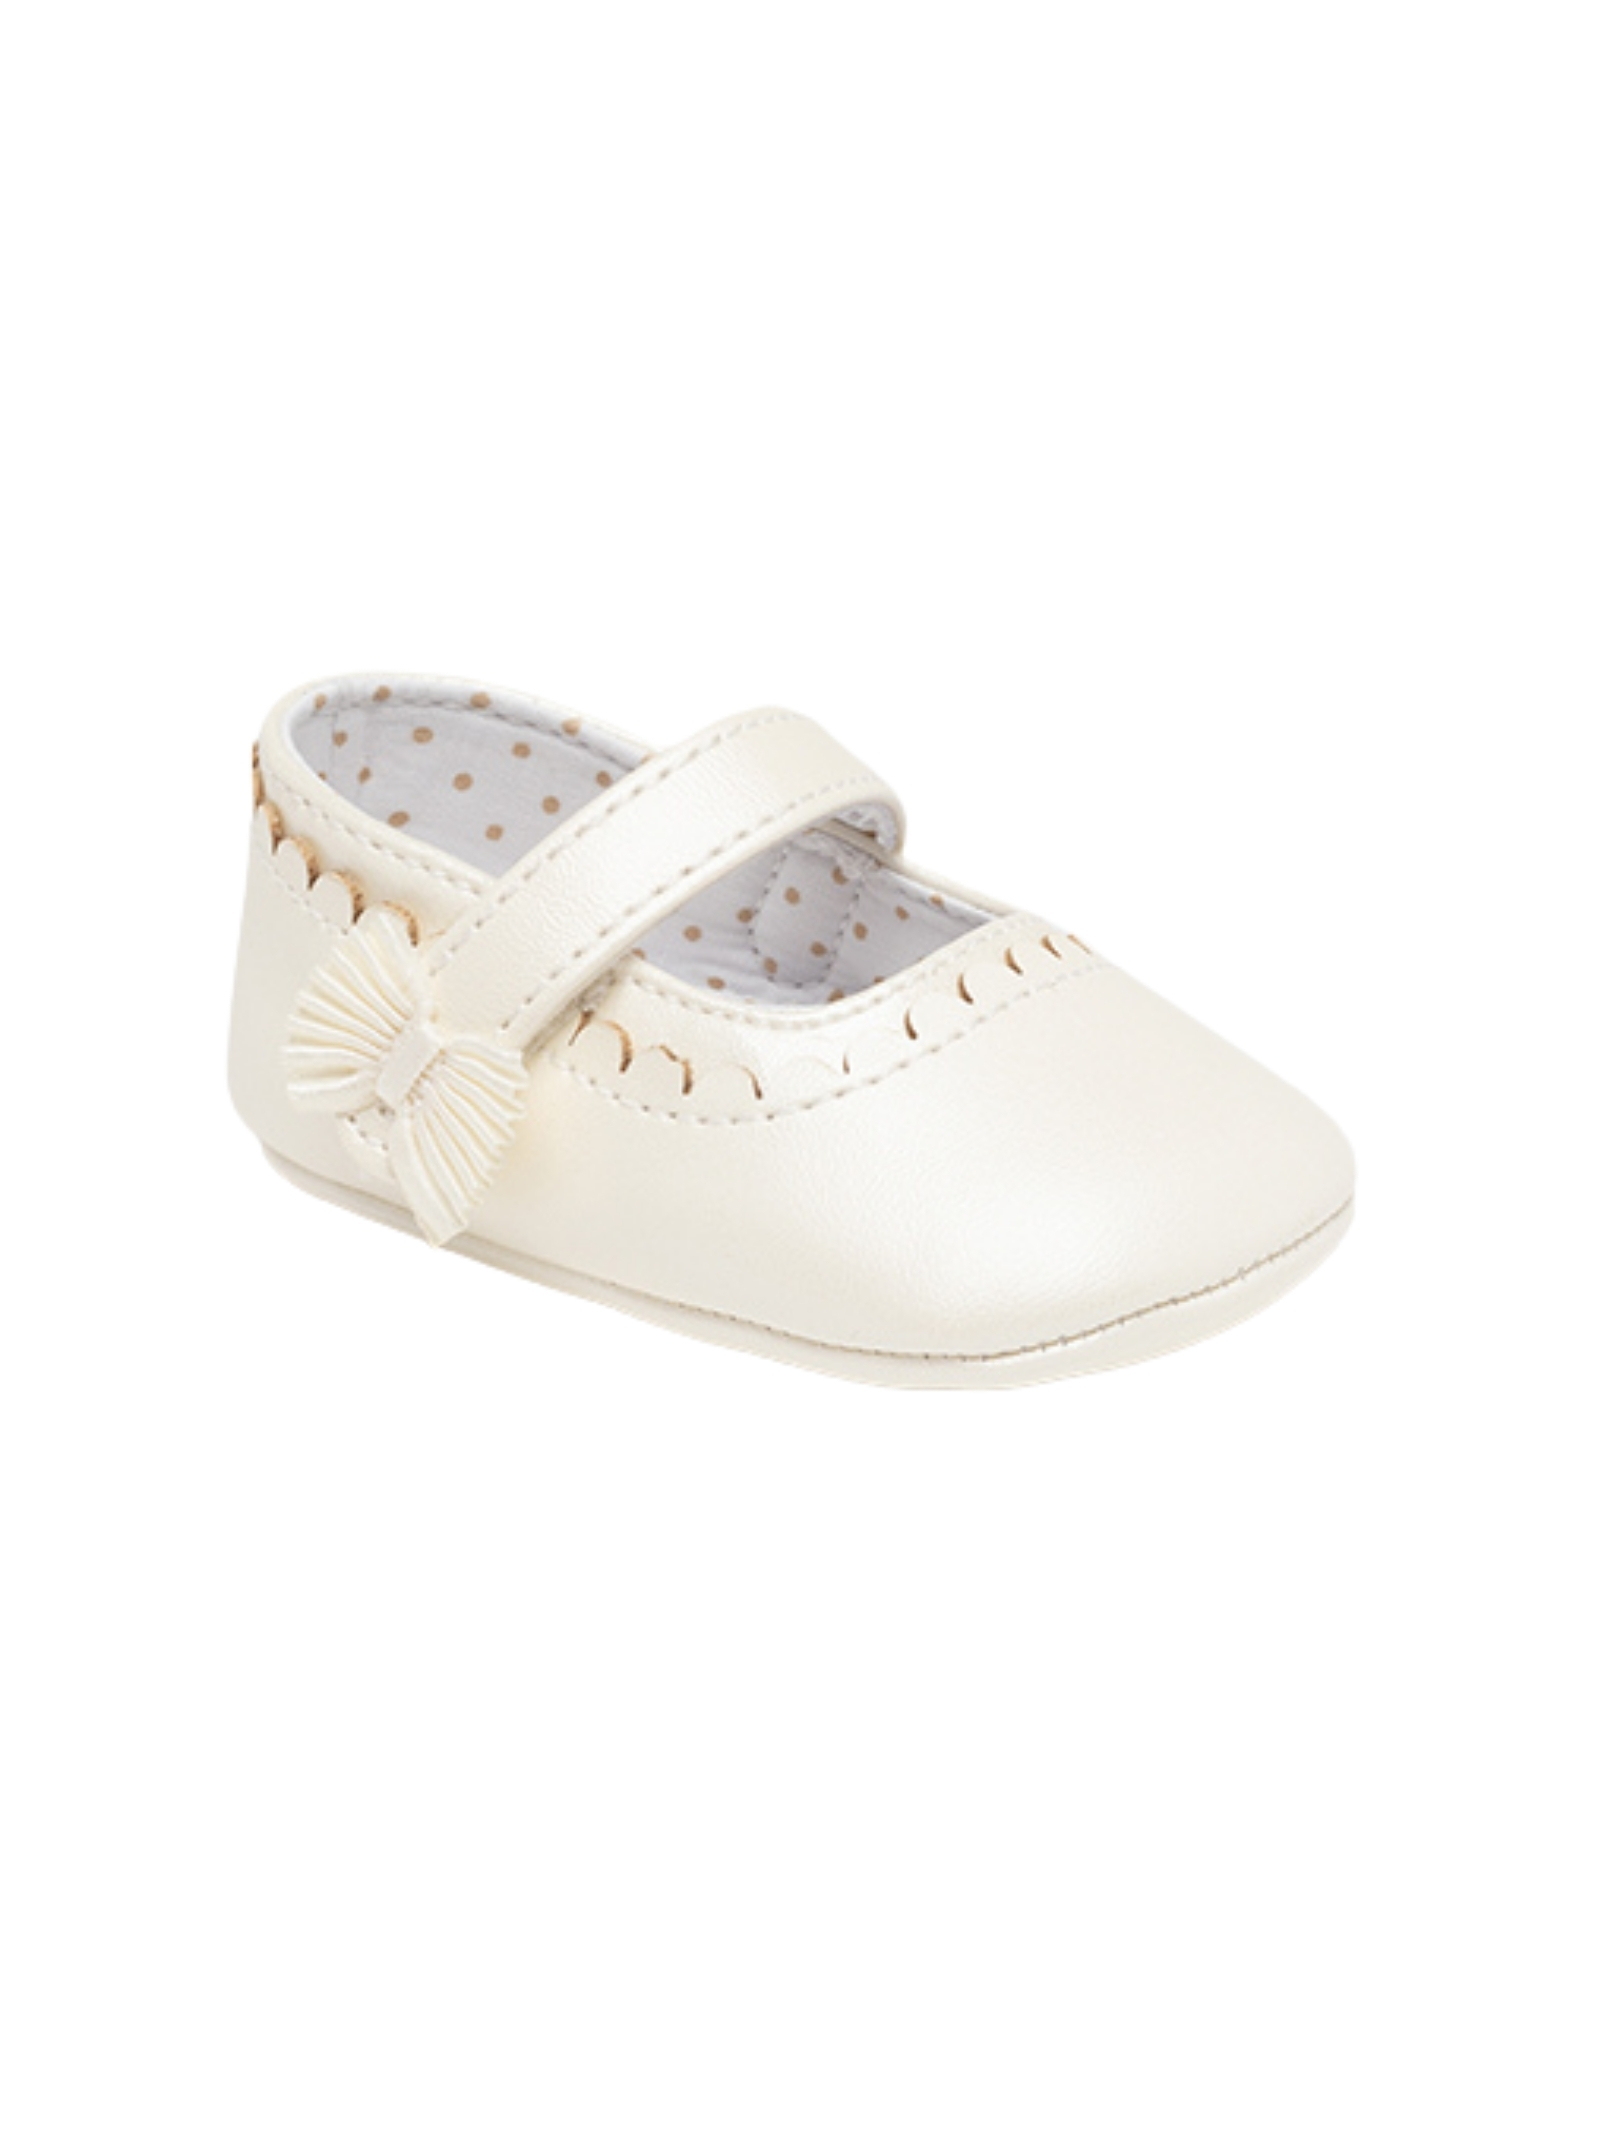 Newborn Elegant Dancer MAYORAL NEWBORN | Shoes | 9456044